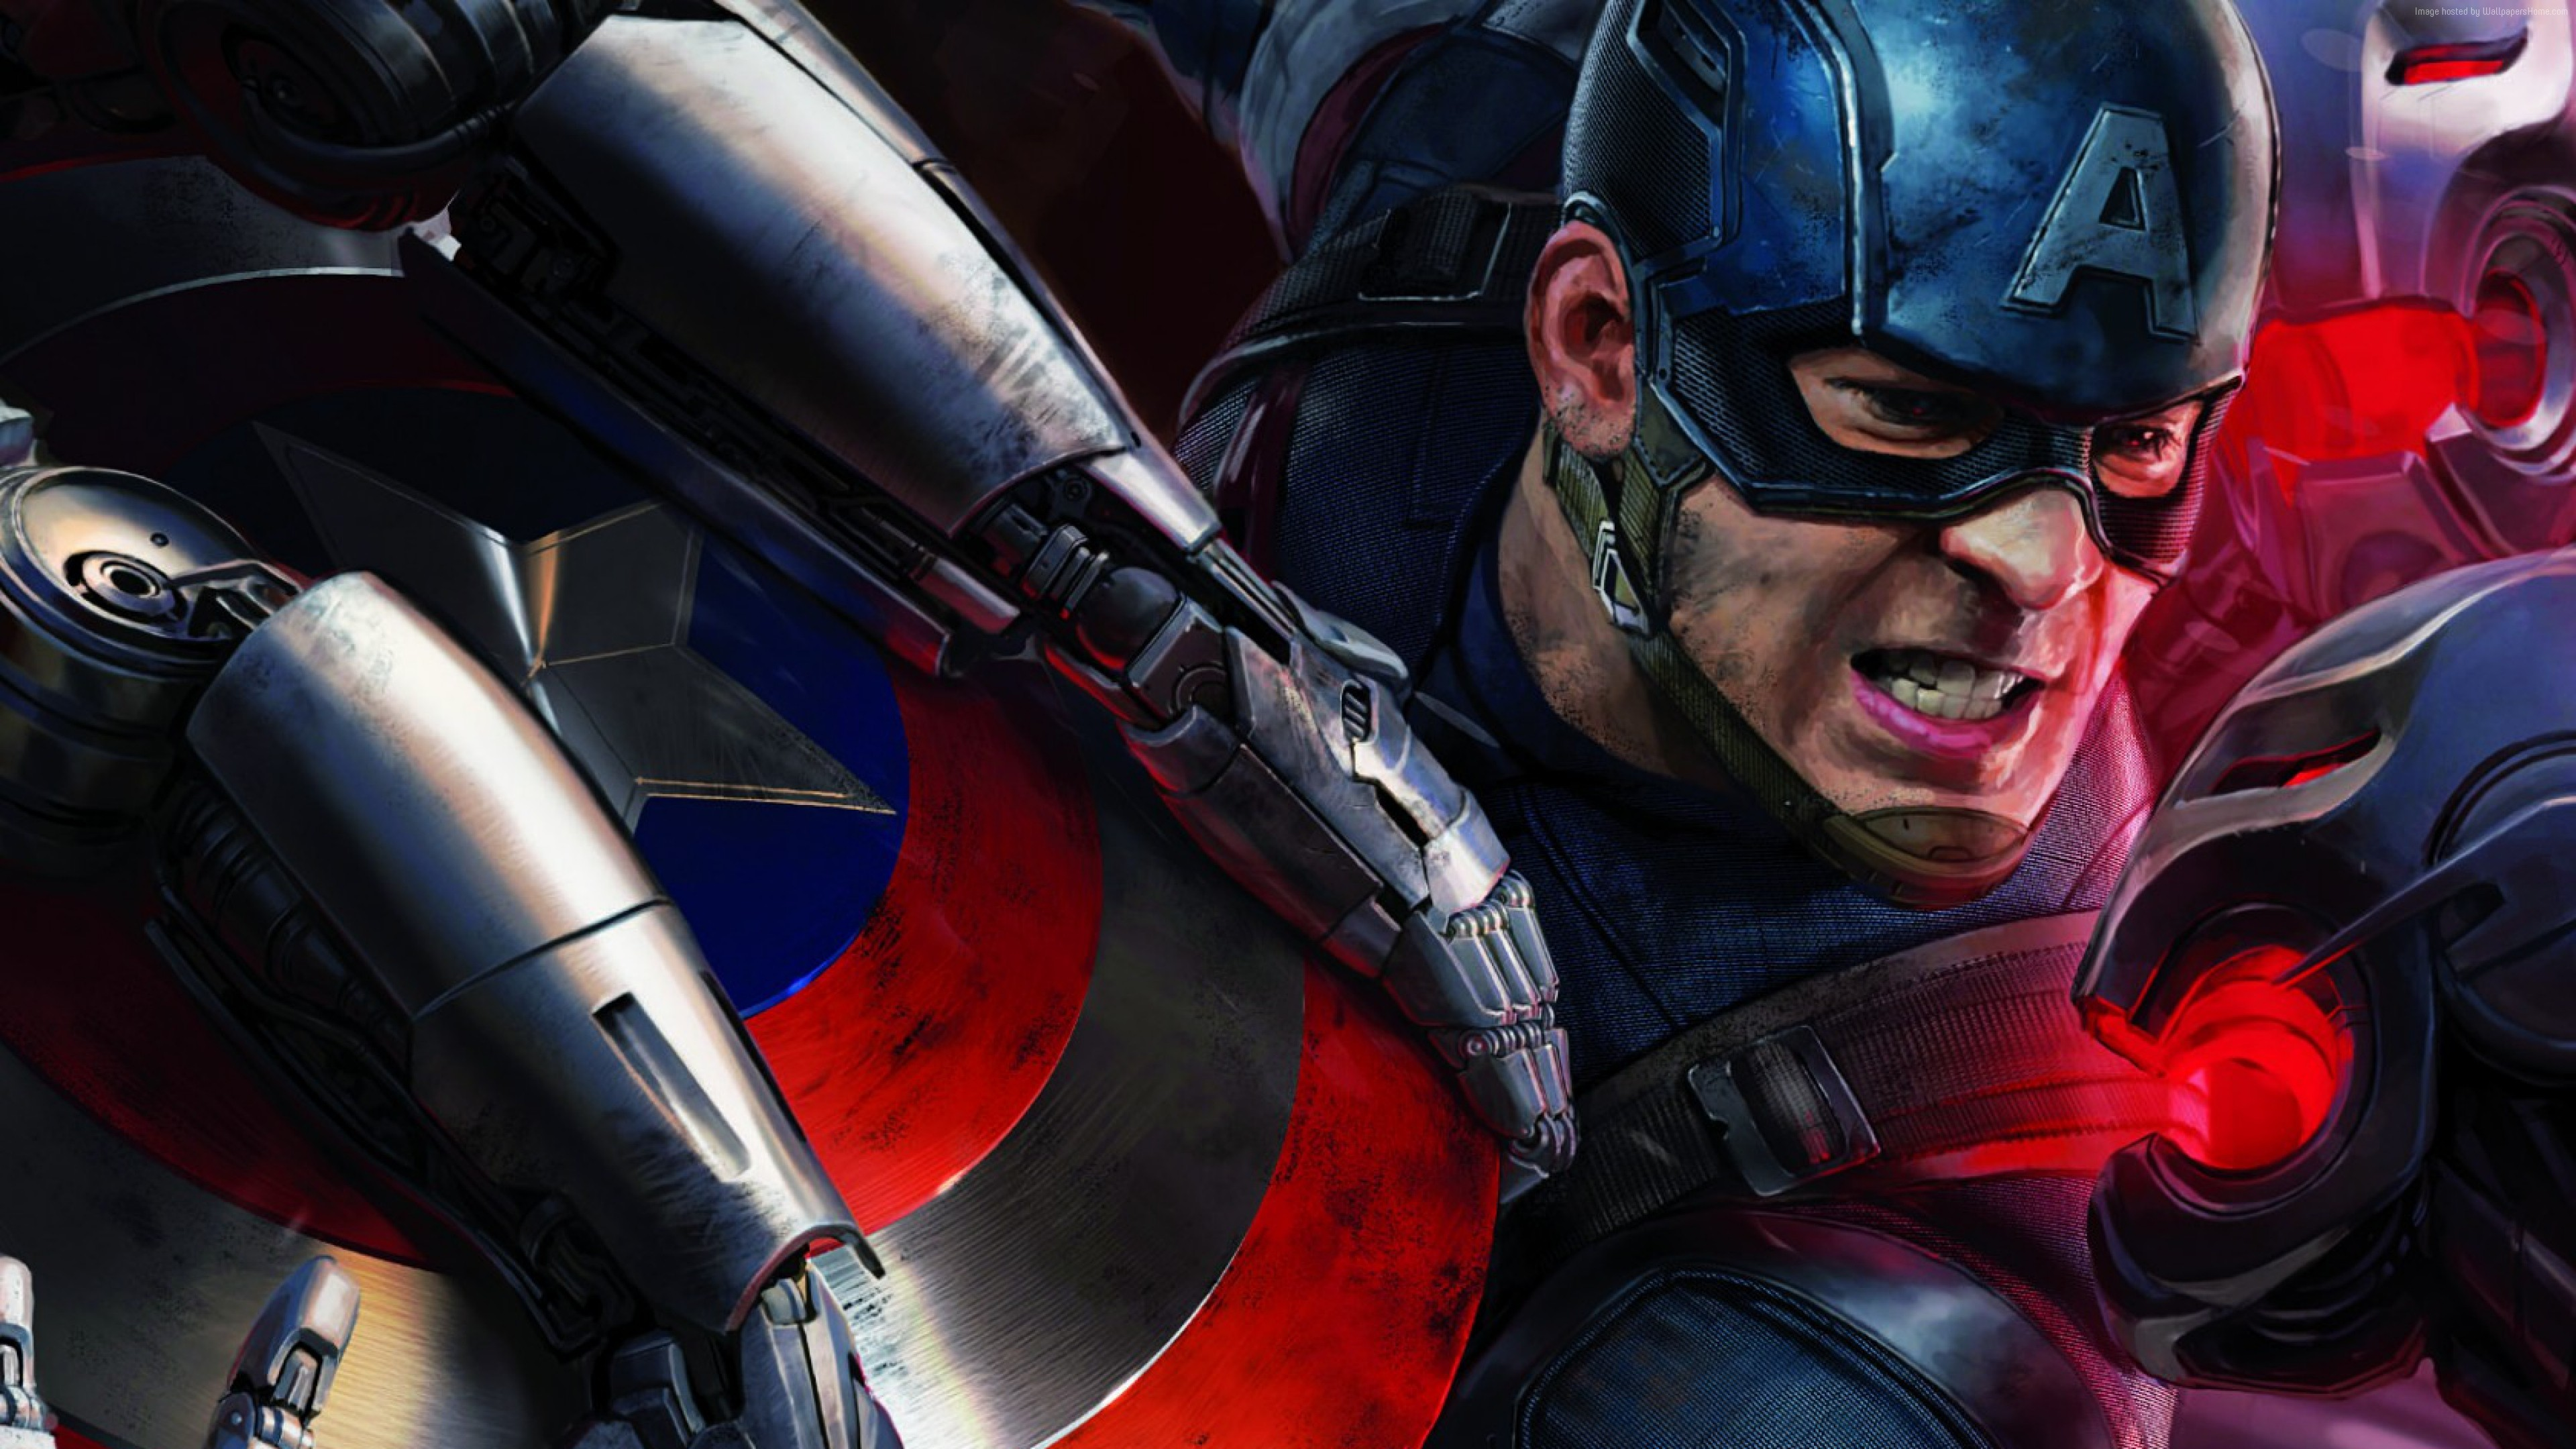 Superhero 4K Movie Wallpaper – Free Wallpaper 4 U